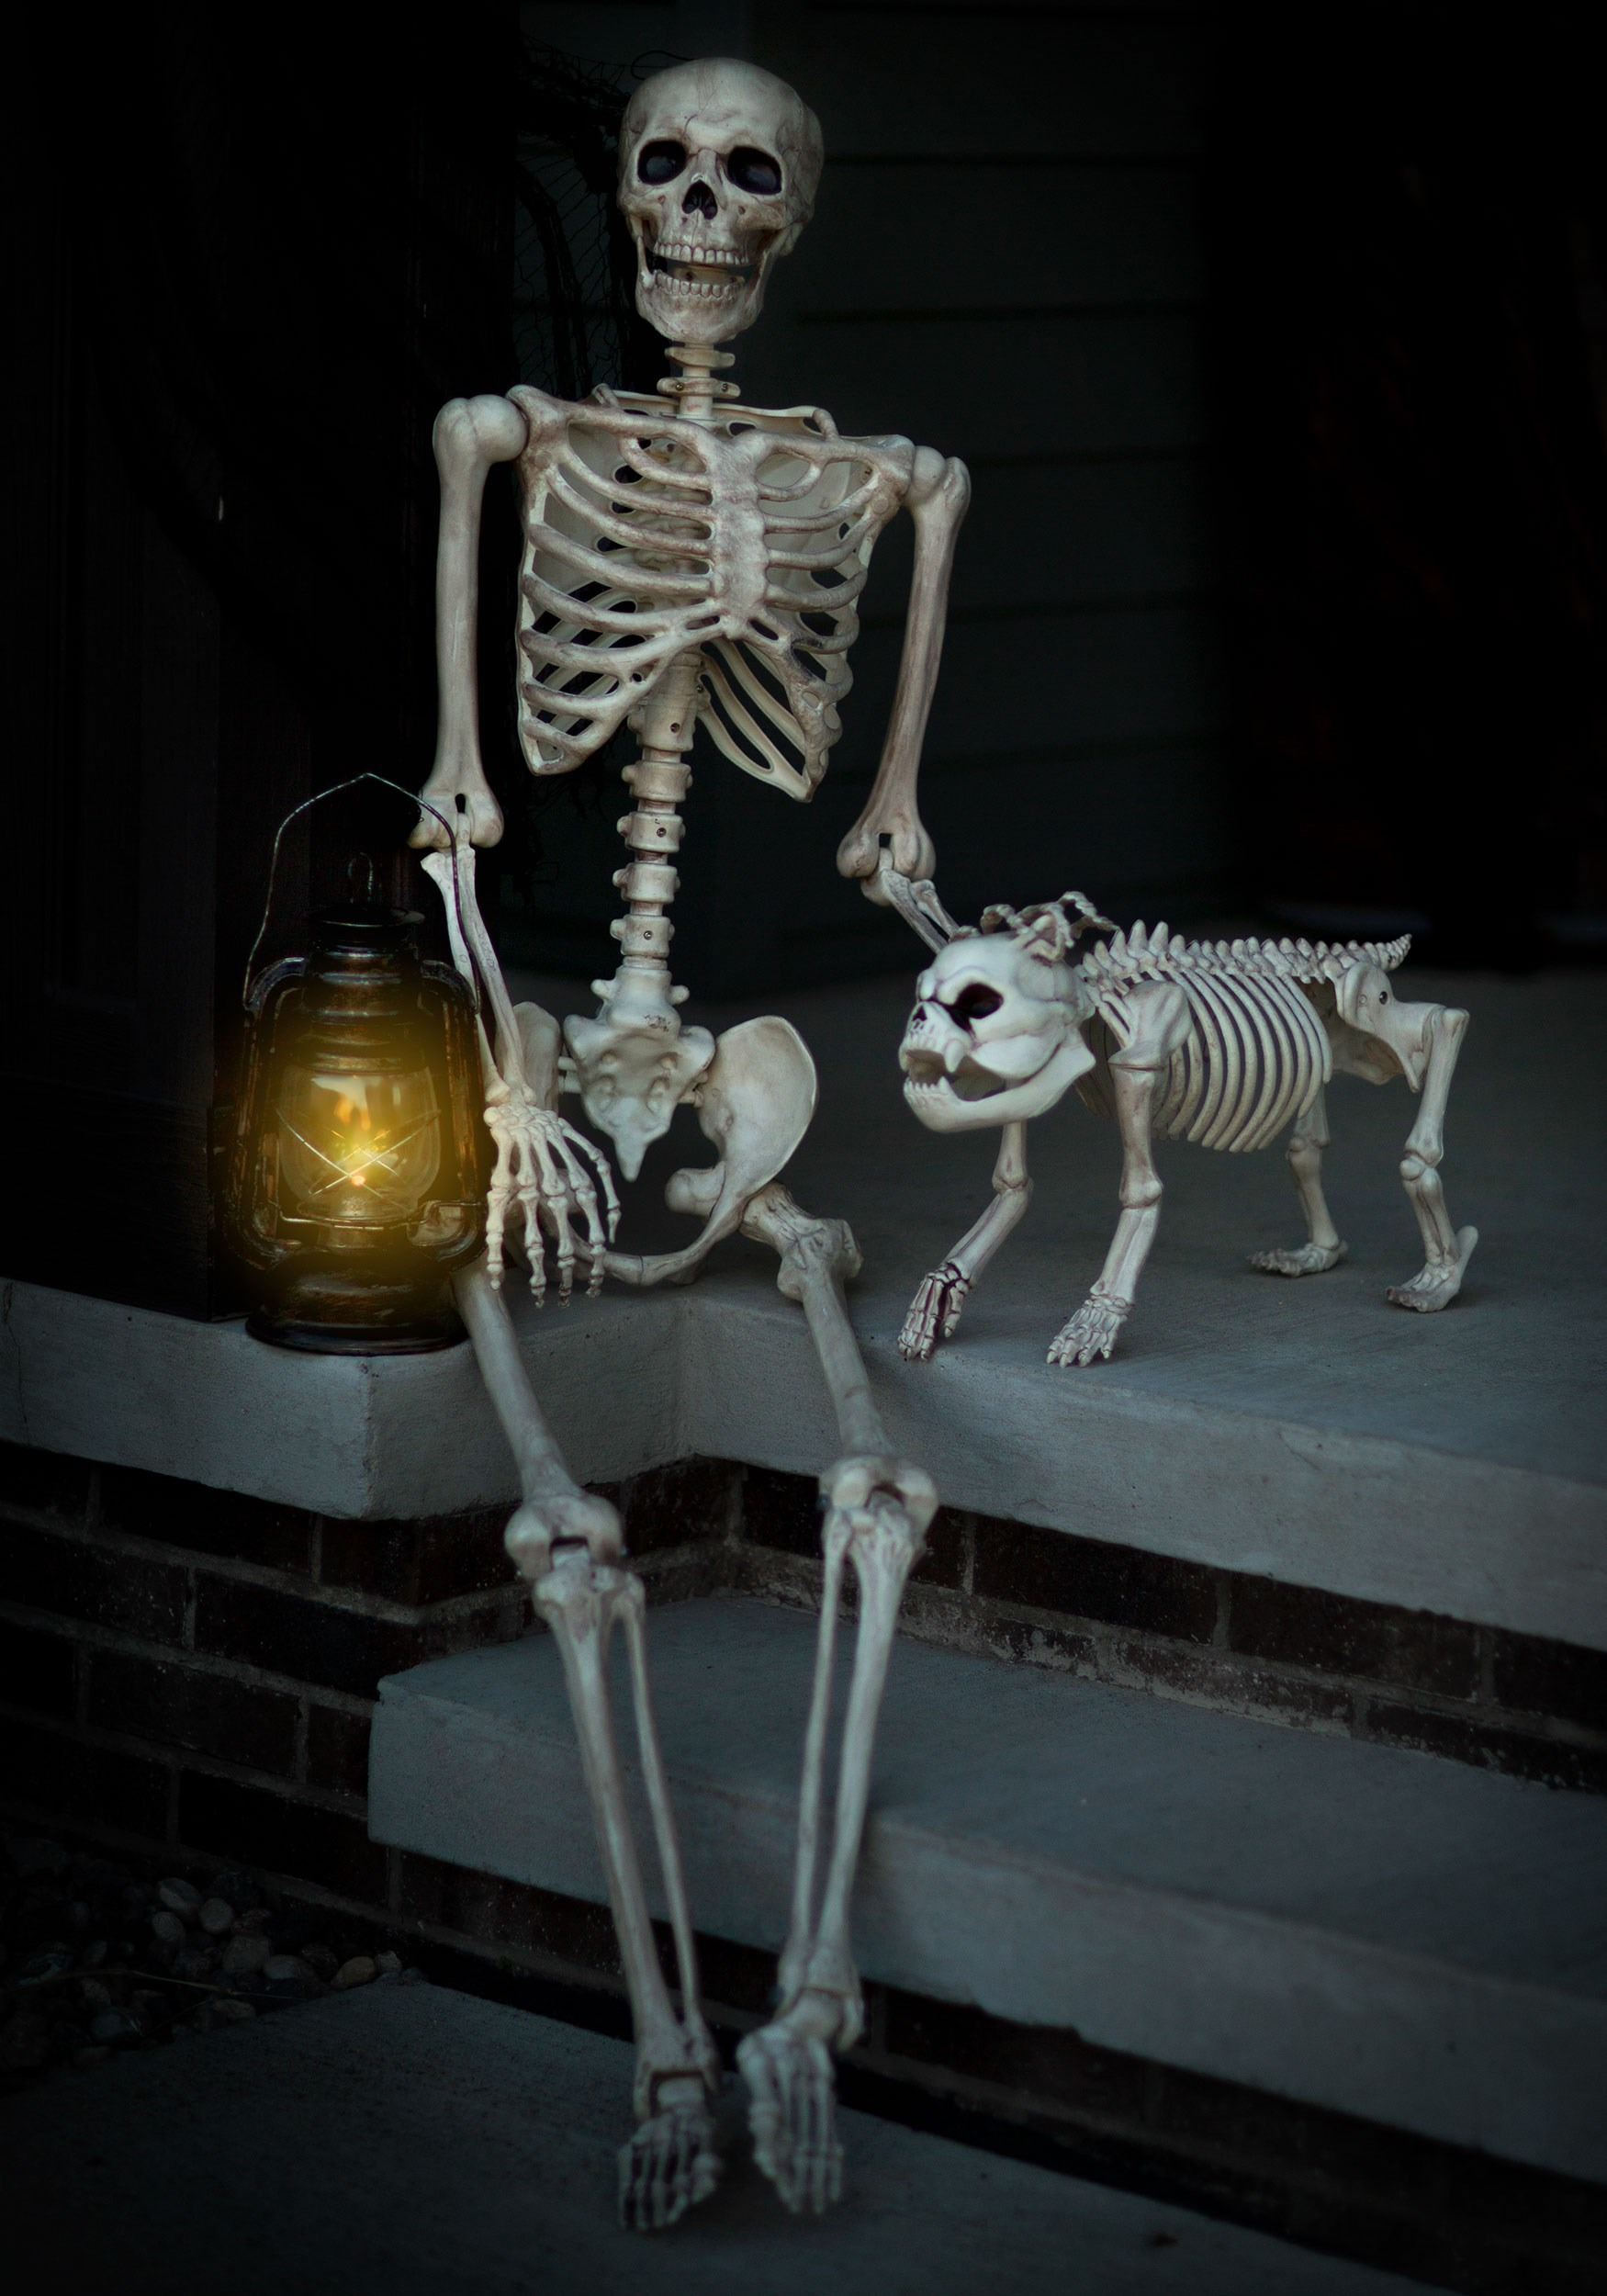 Life Size Poseable Human Skeleton